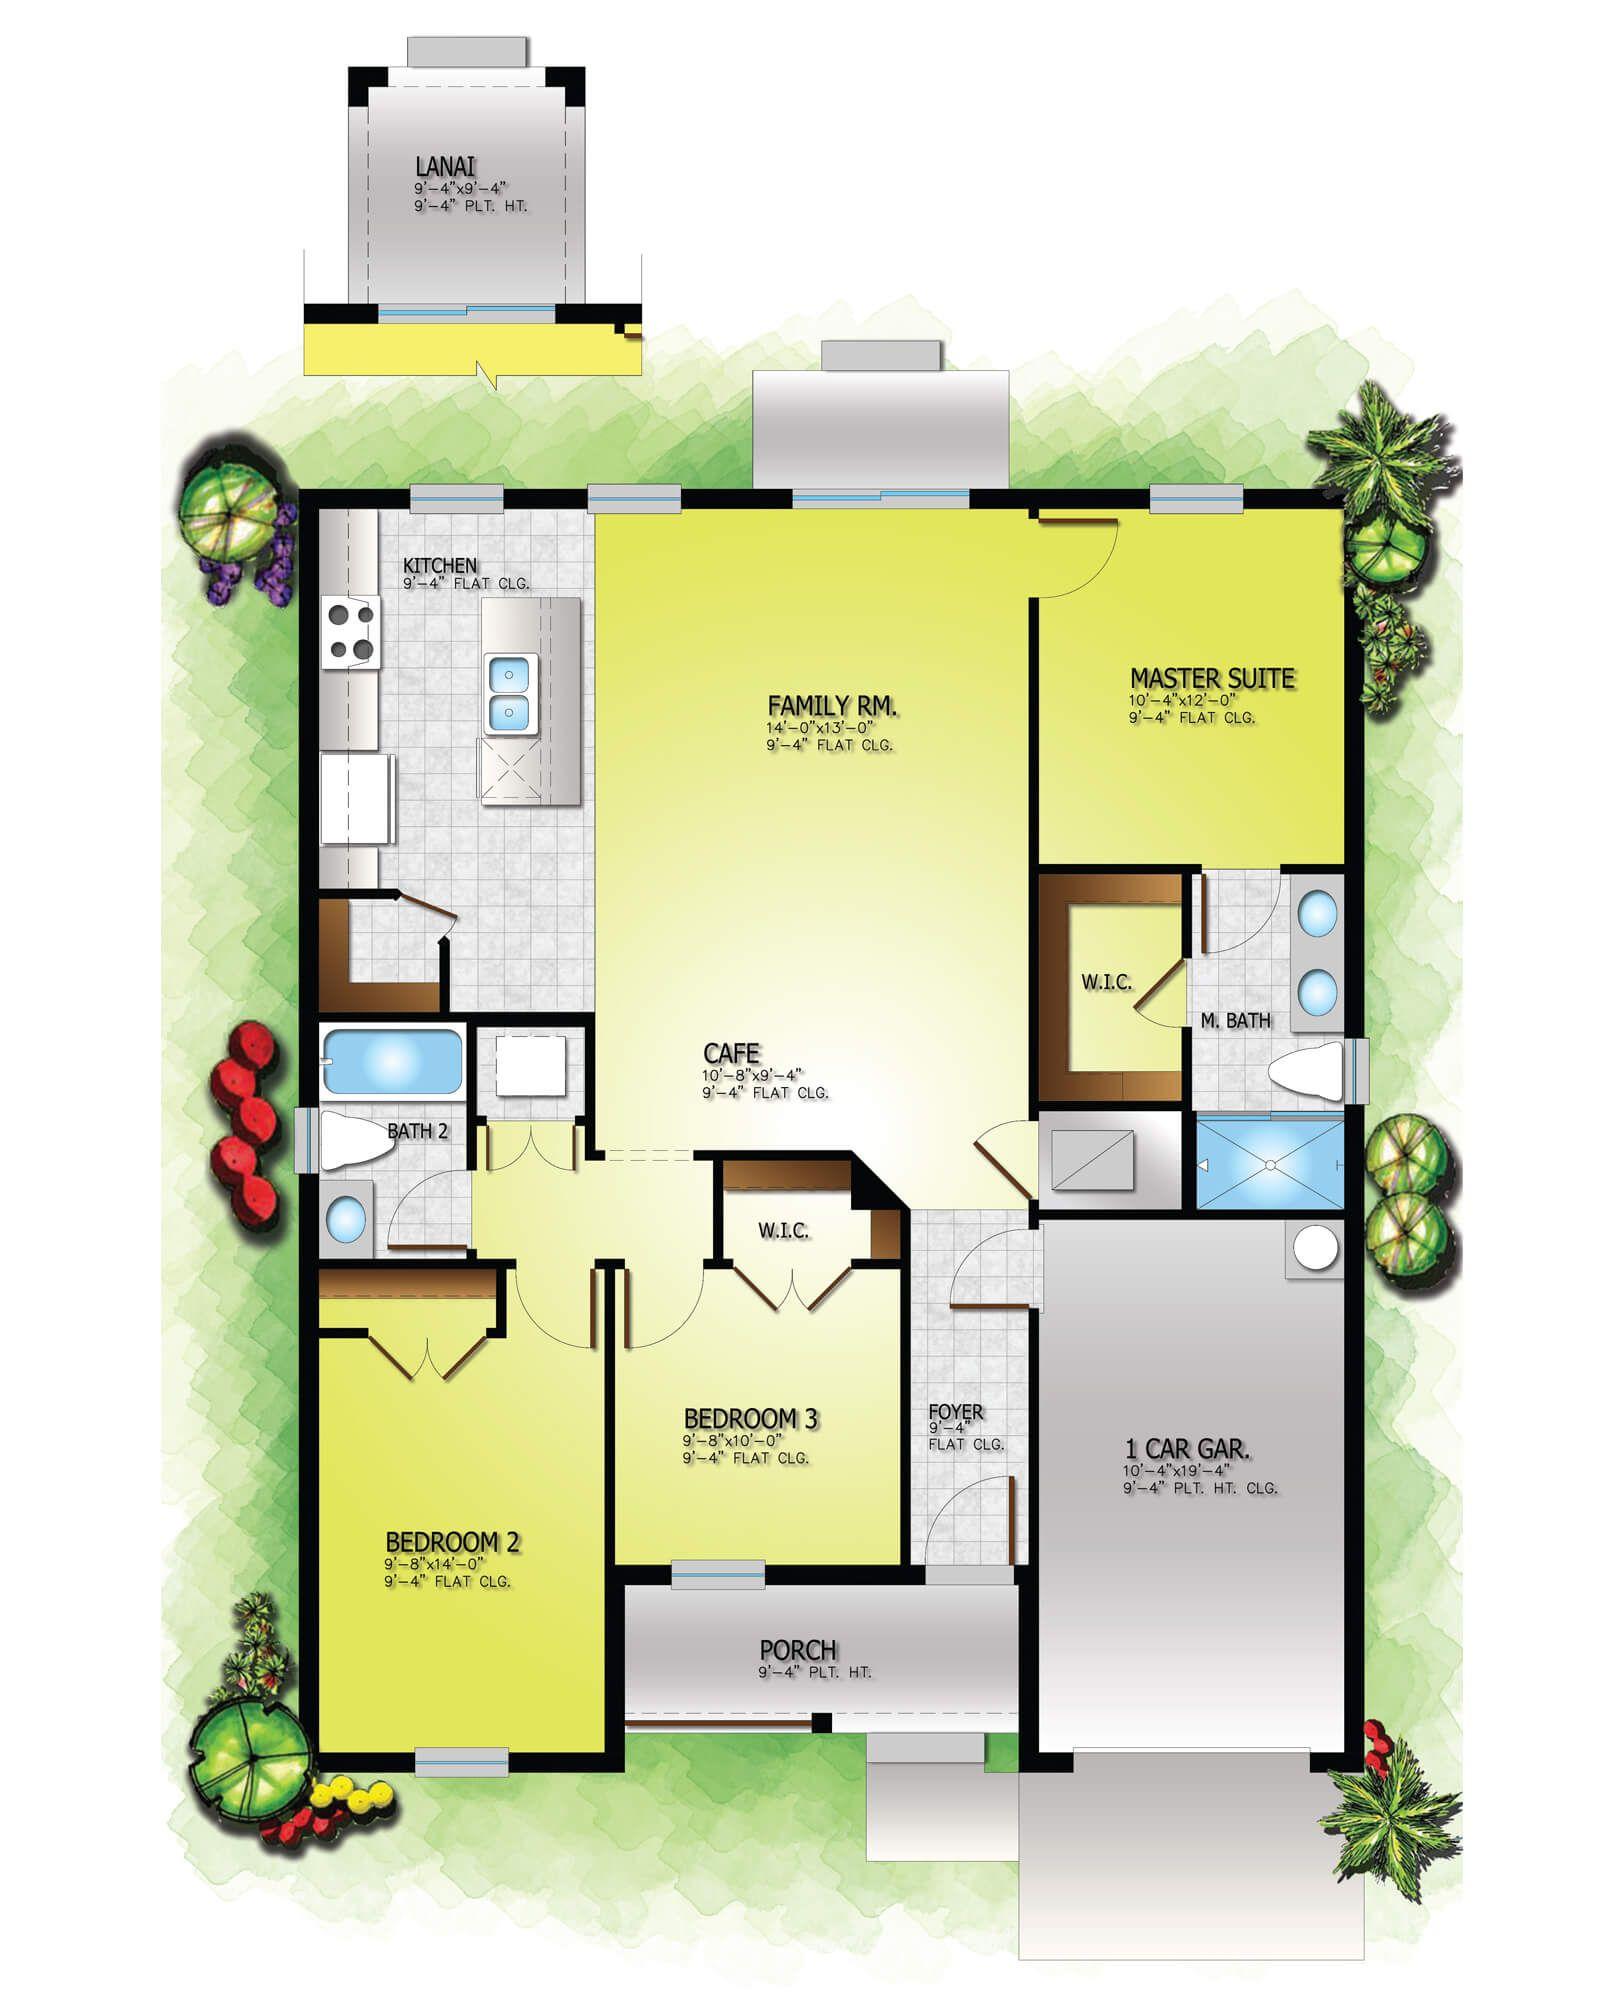 Urban 360 New Affordable Homes Tampa Domain Homes Fiberglass Exterior Doors Garage Interior Finished Garage